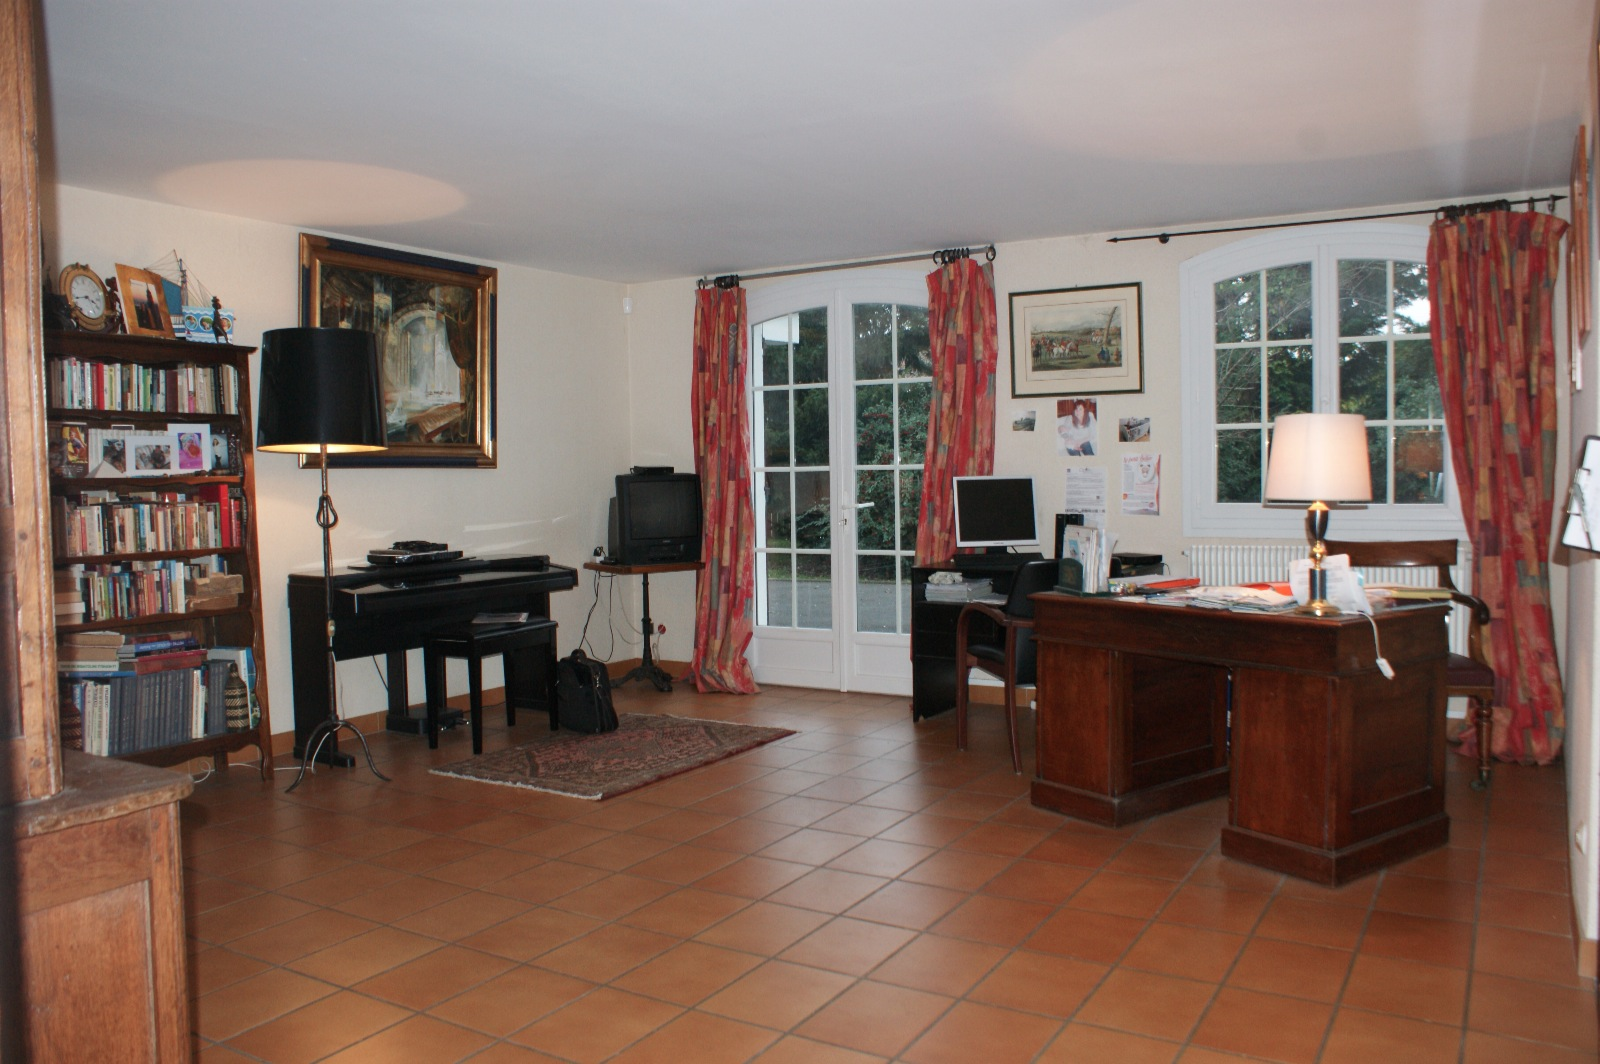 Vente villa gujan mestras 33470 188m avec 5 pi ce s for Achat maison gujan mestras